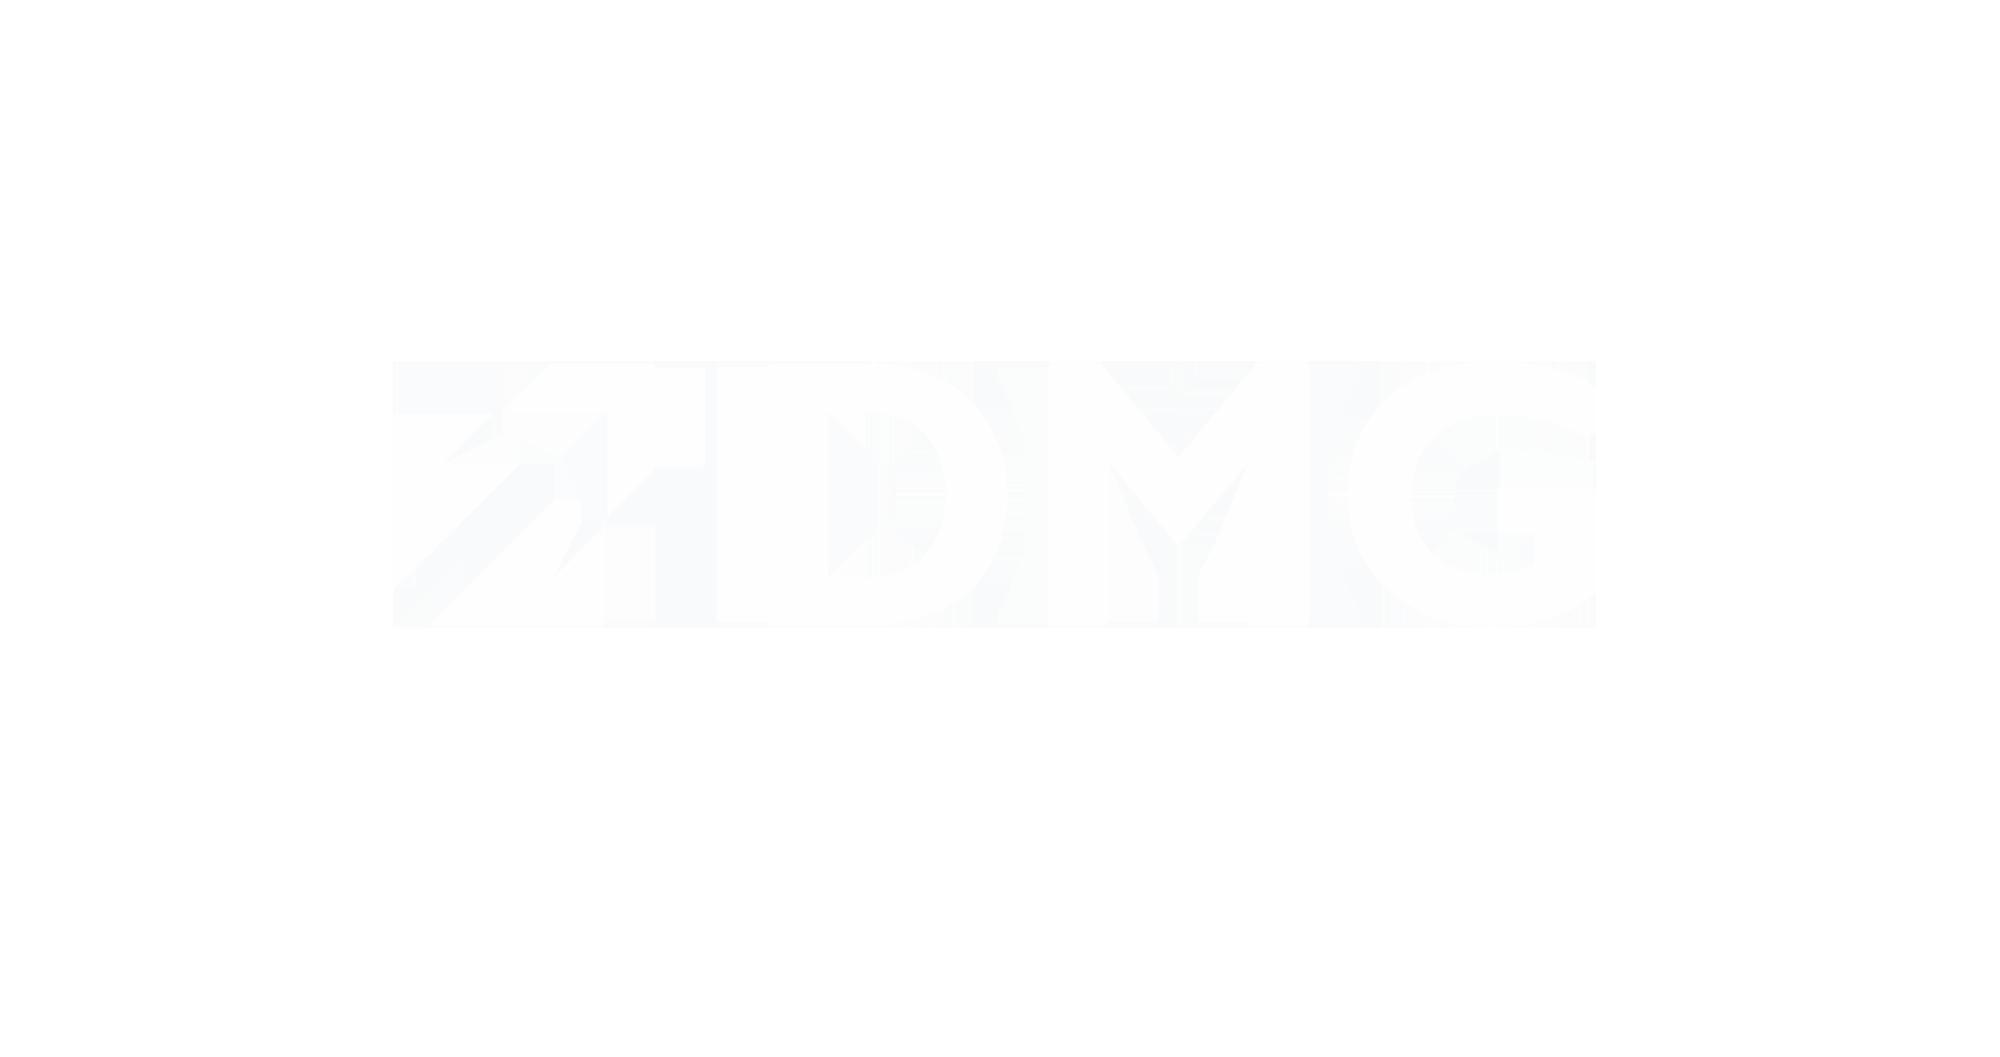 DMG styleitaliano products